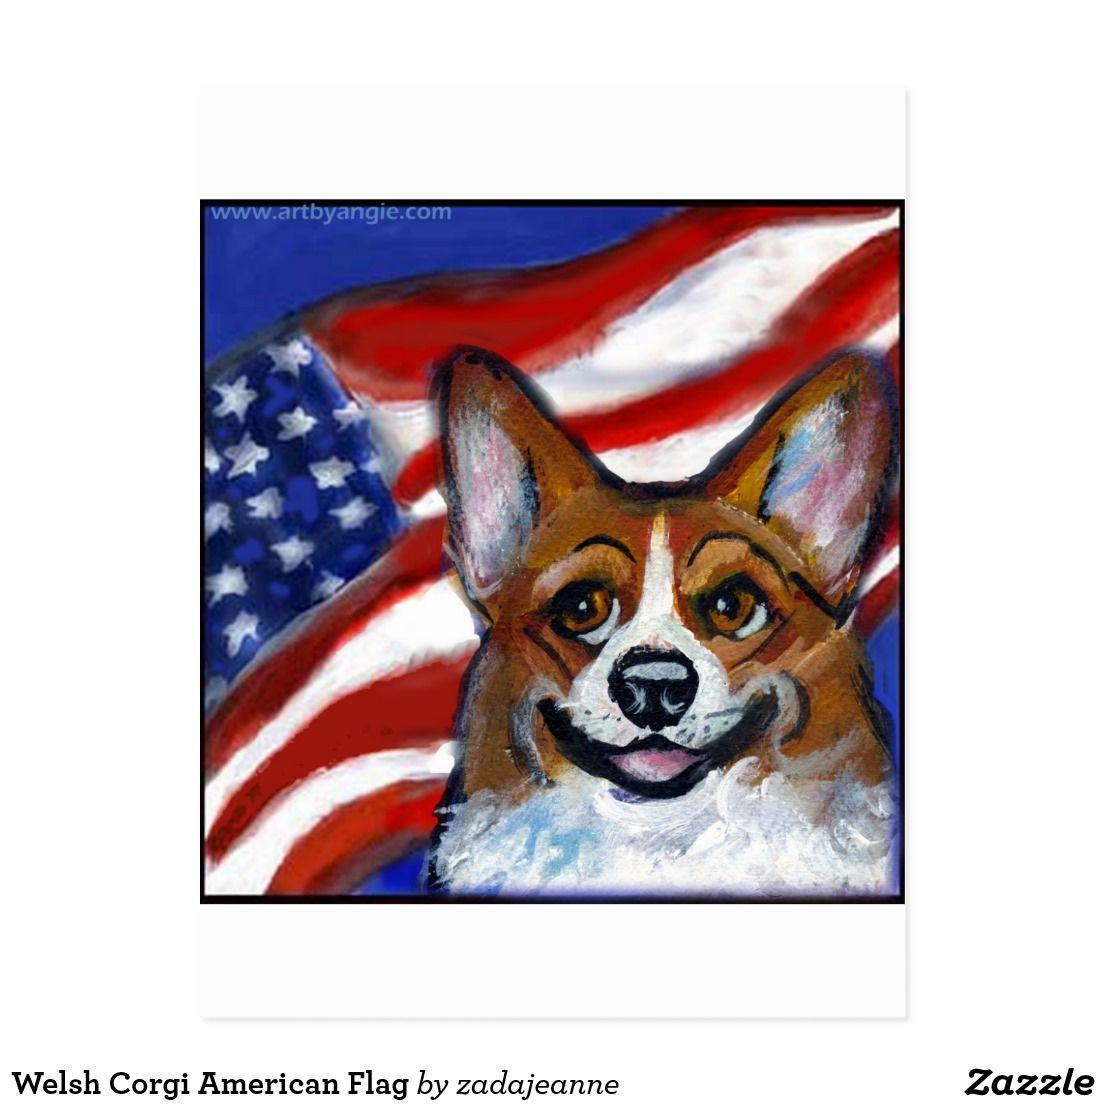 Welsh Corgi American Flag Postcard.